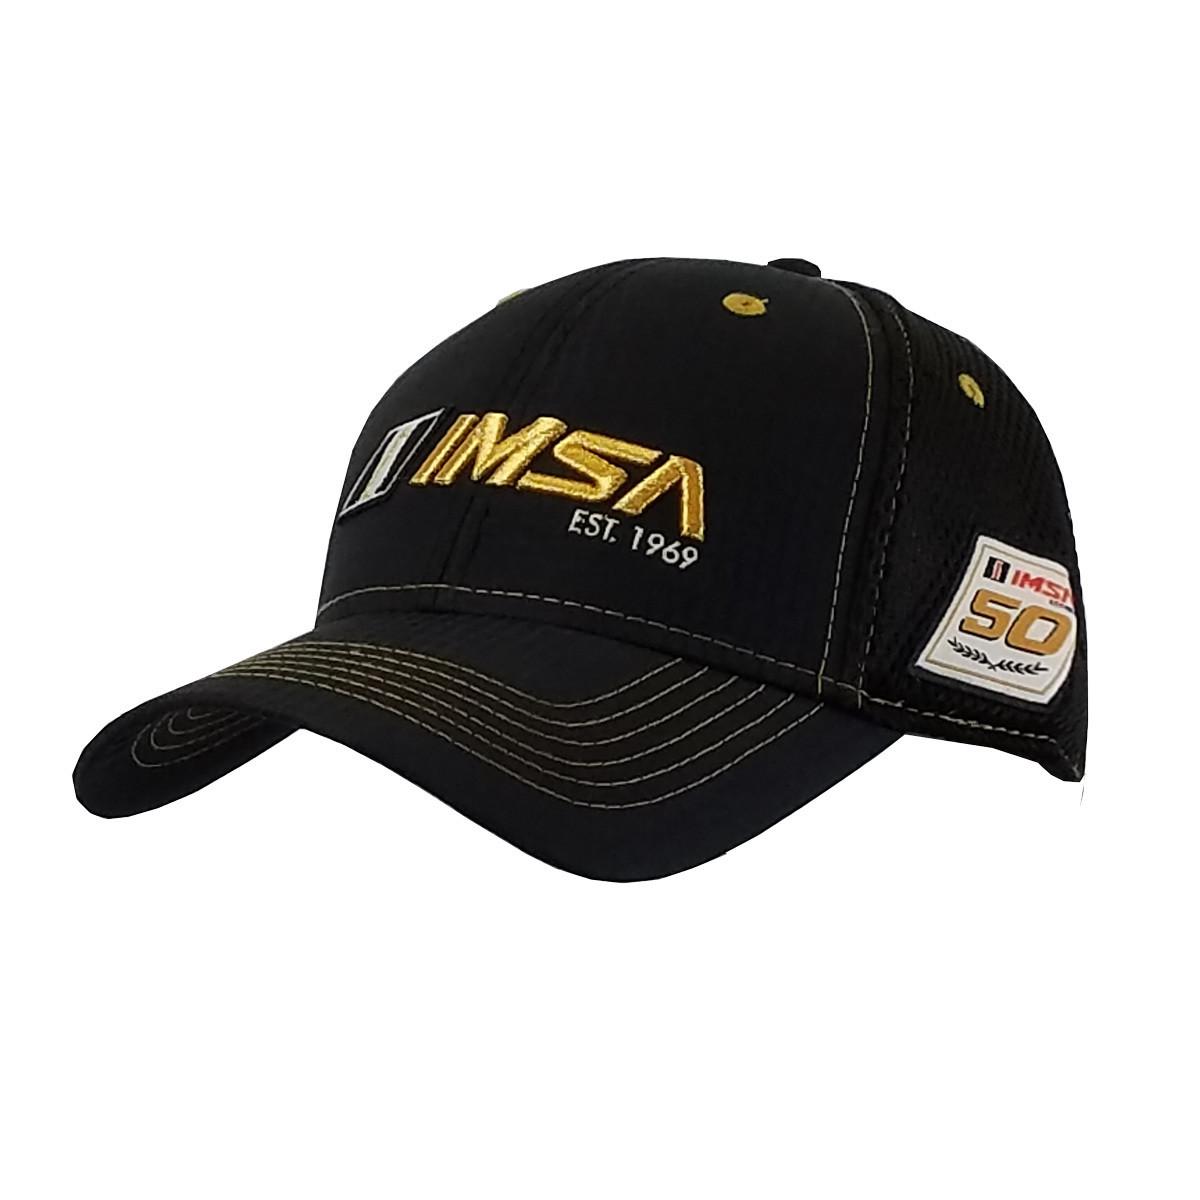 IMSA Gold Air Mesh Hat Blk